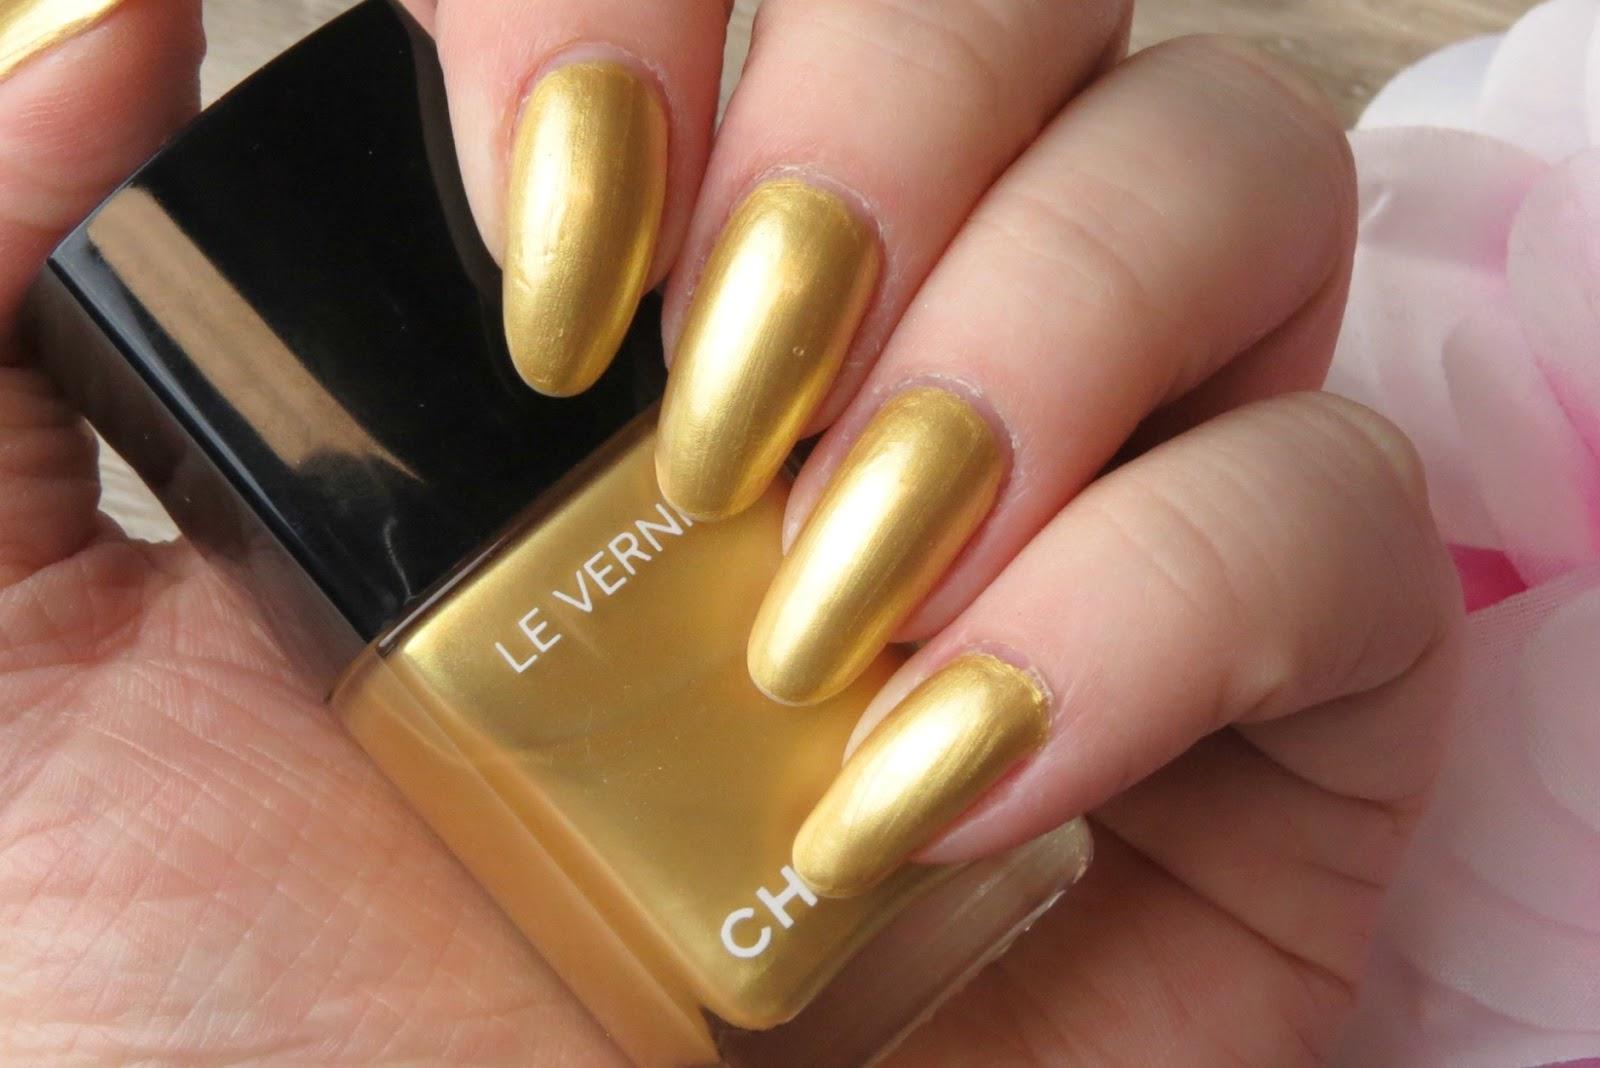 Chanel Longwear Nail Polishes | Kaitlyn Elisabeth Beauty